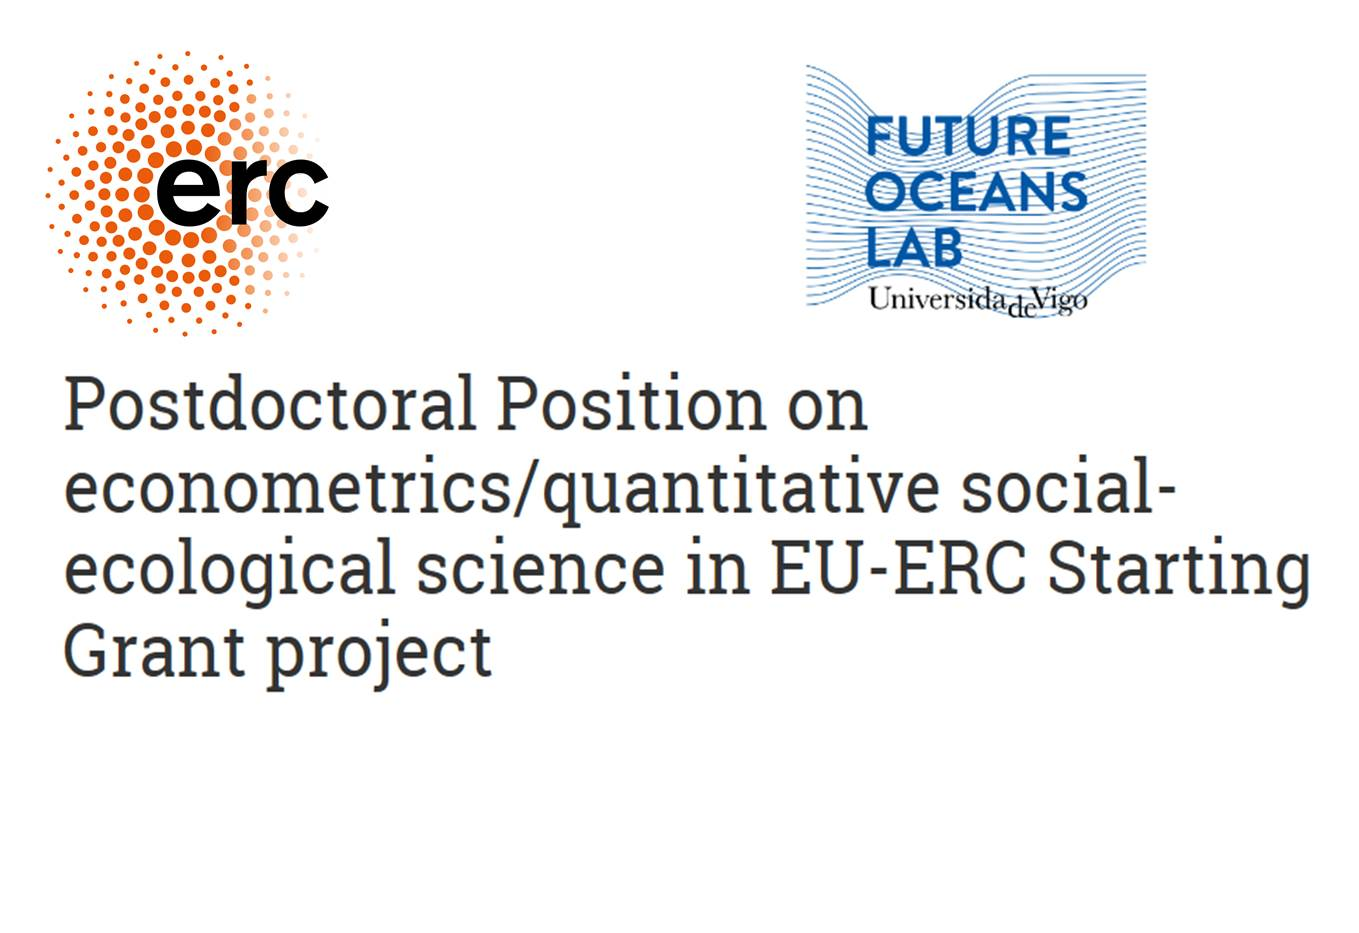 New Postdoctoral Position on econometrics/quantitative